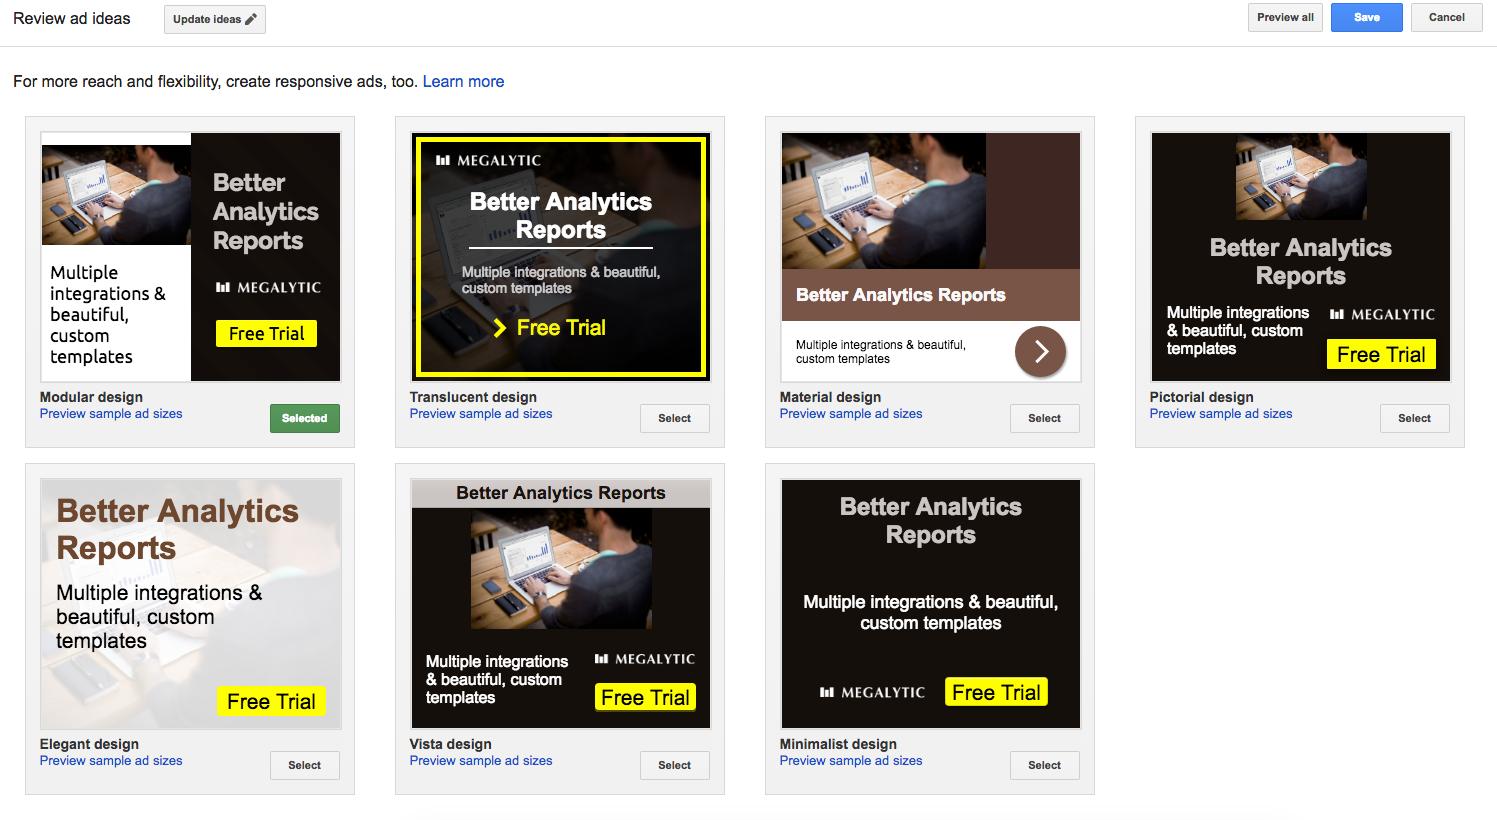 Automatic Image Ads